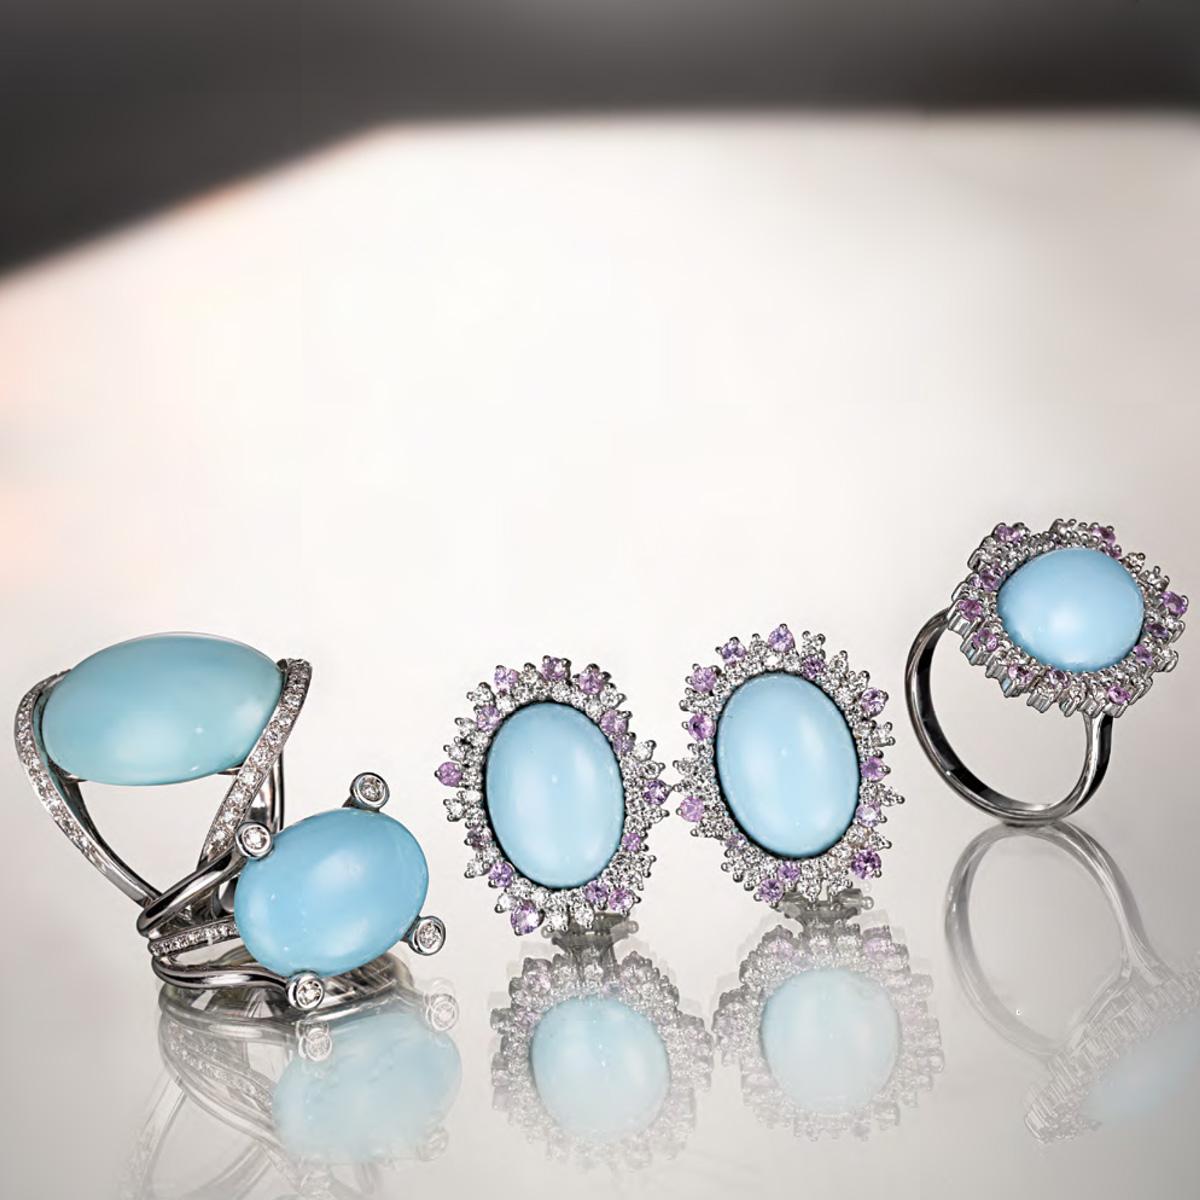 Gioielli Turchese - Turquoise jewels